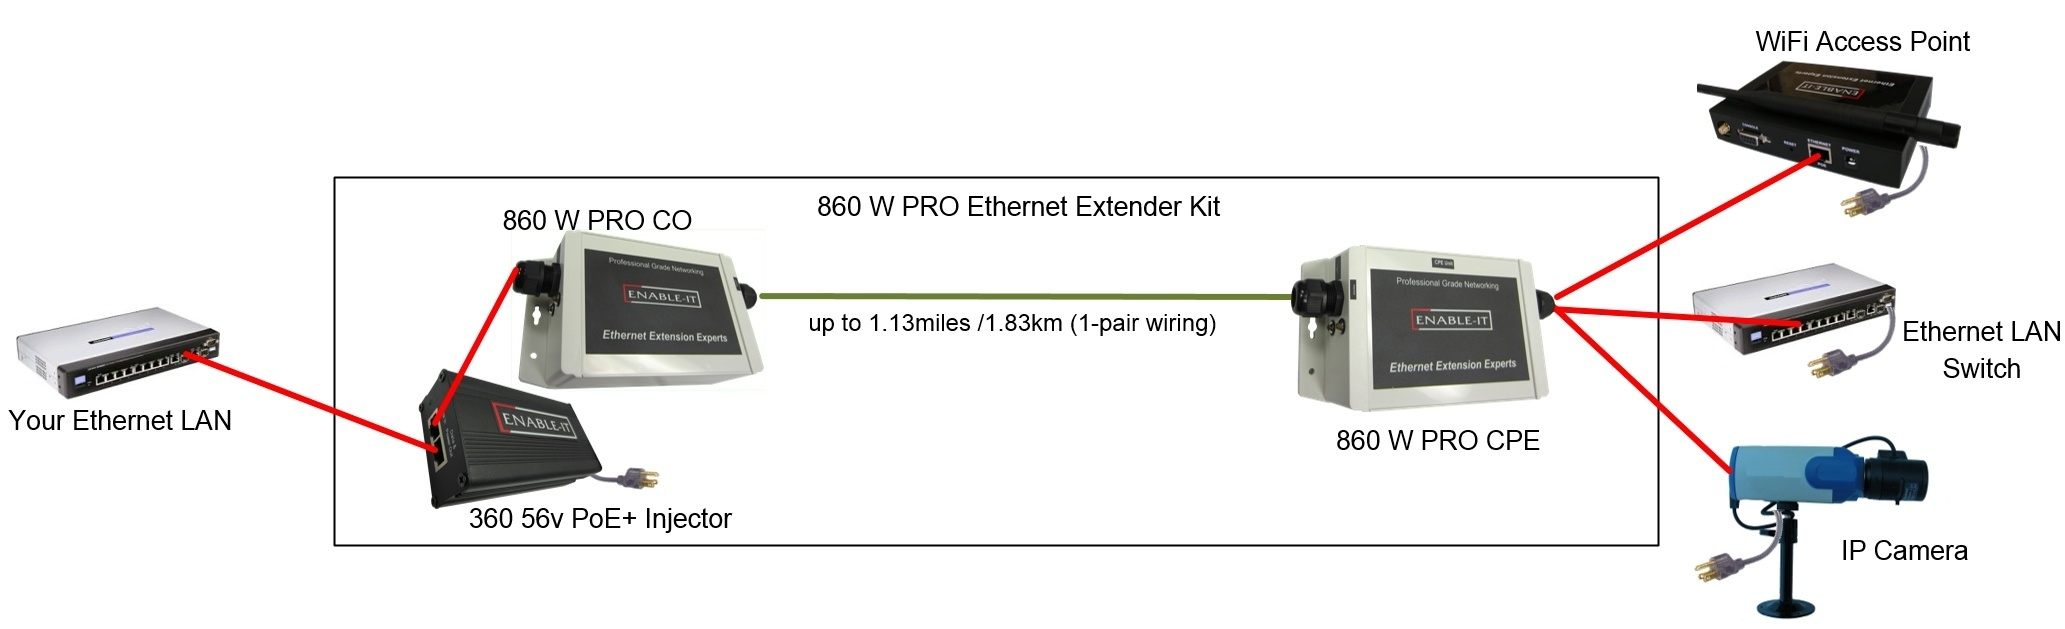 860w Pro 1 Pair Outdoor Gigabit Ethernet Extender Betterbox Wiring Application Diagram Will Open In New Window